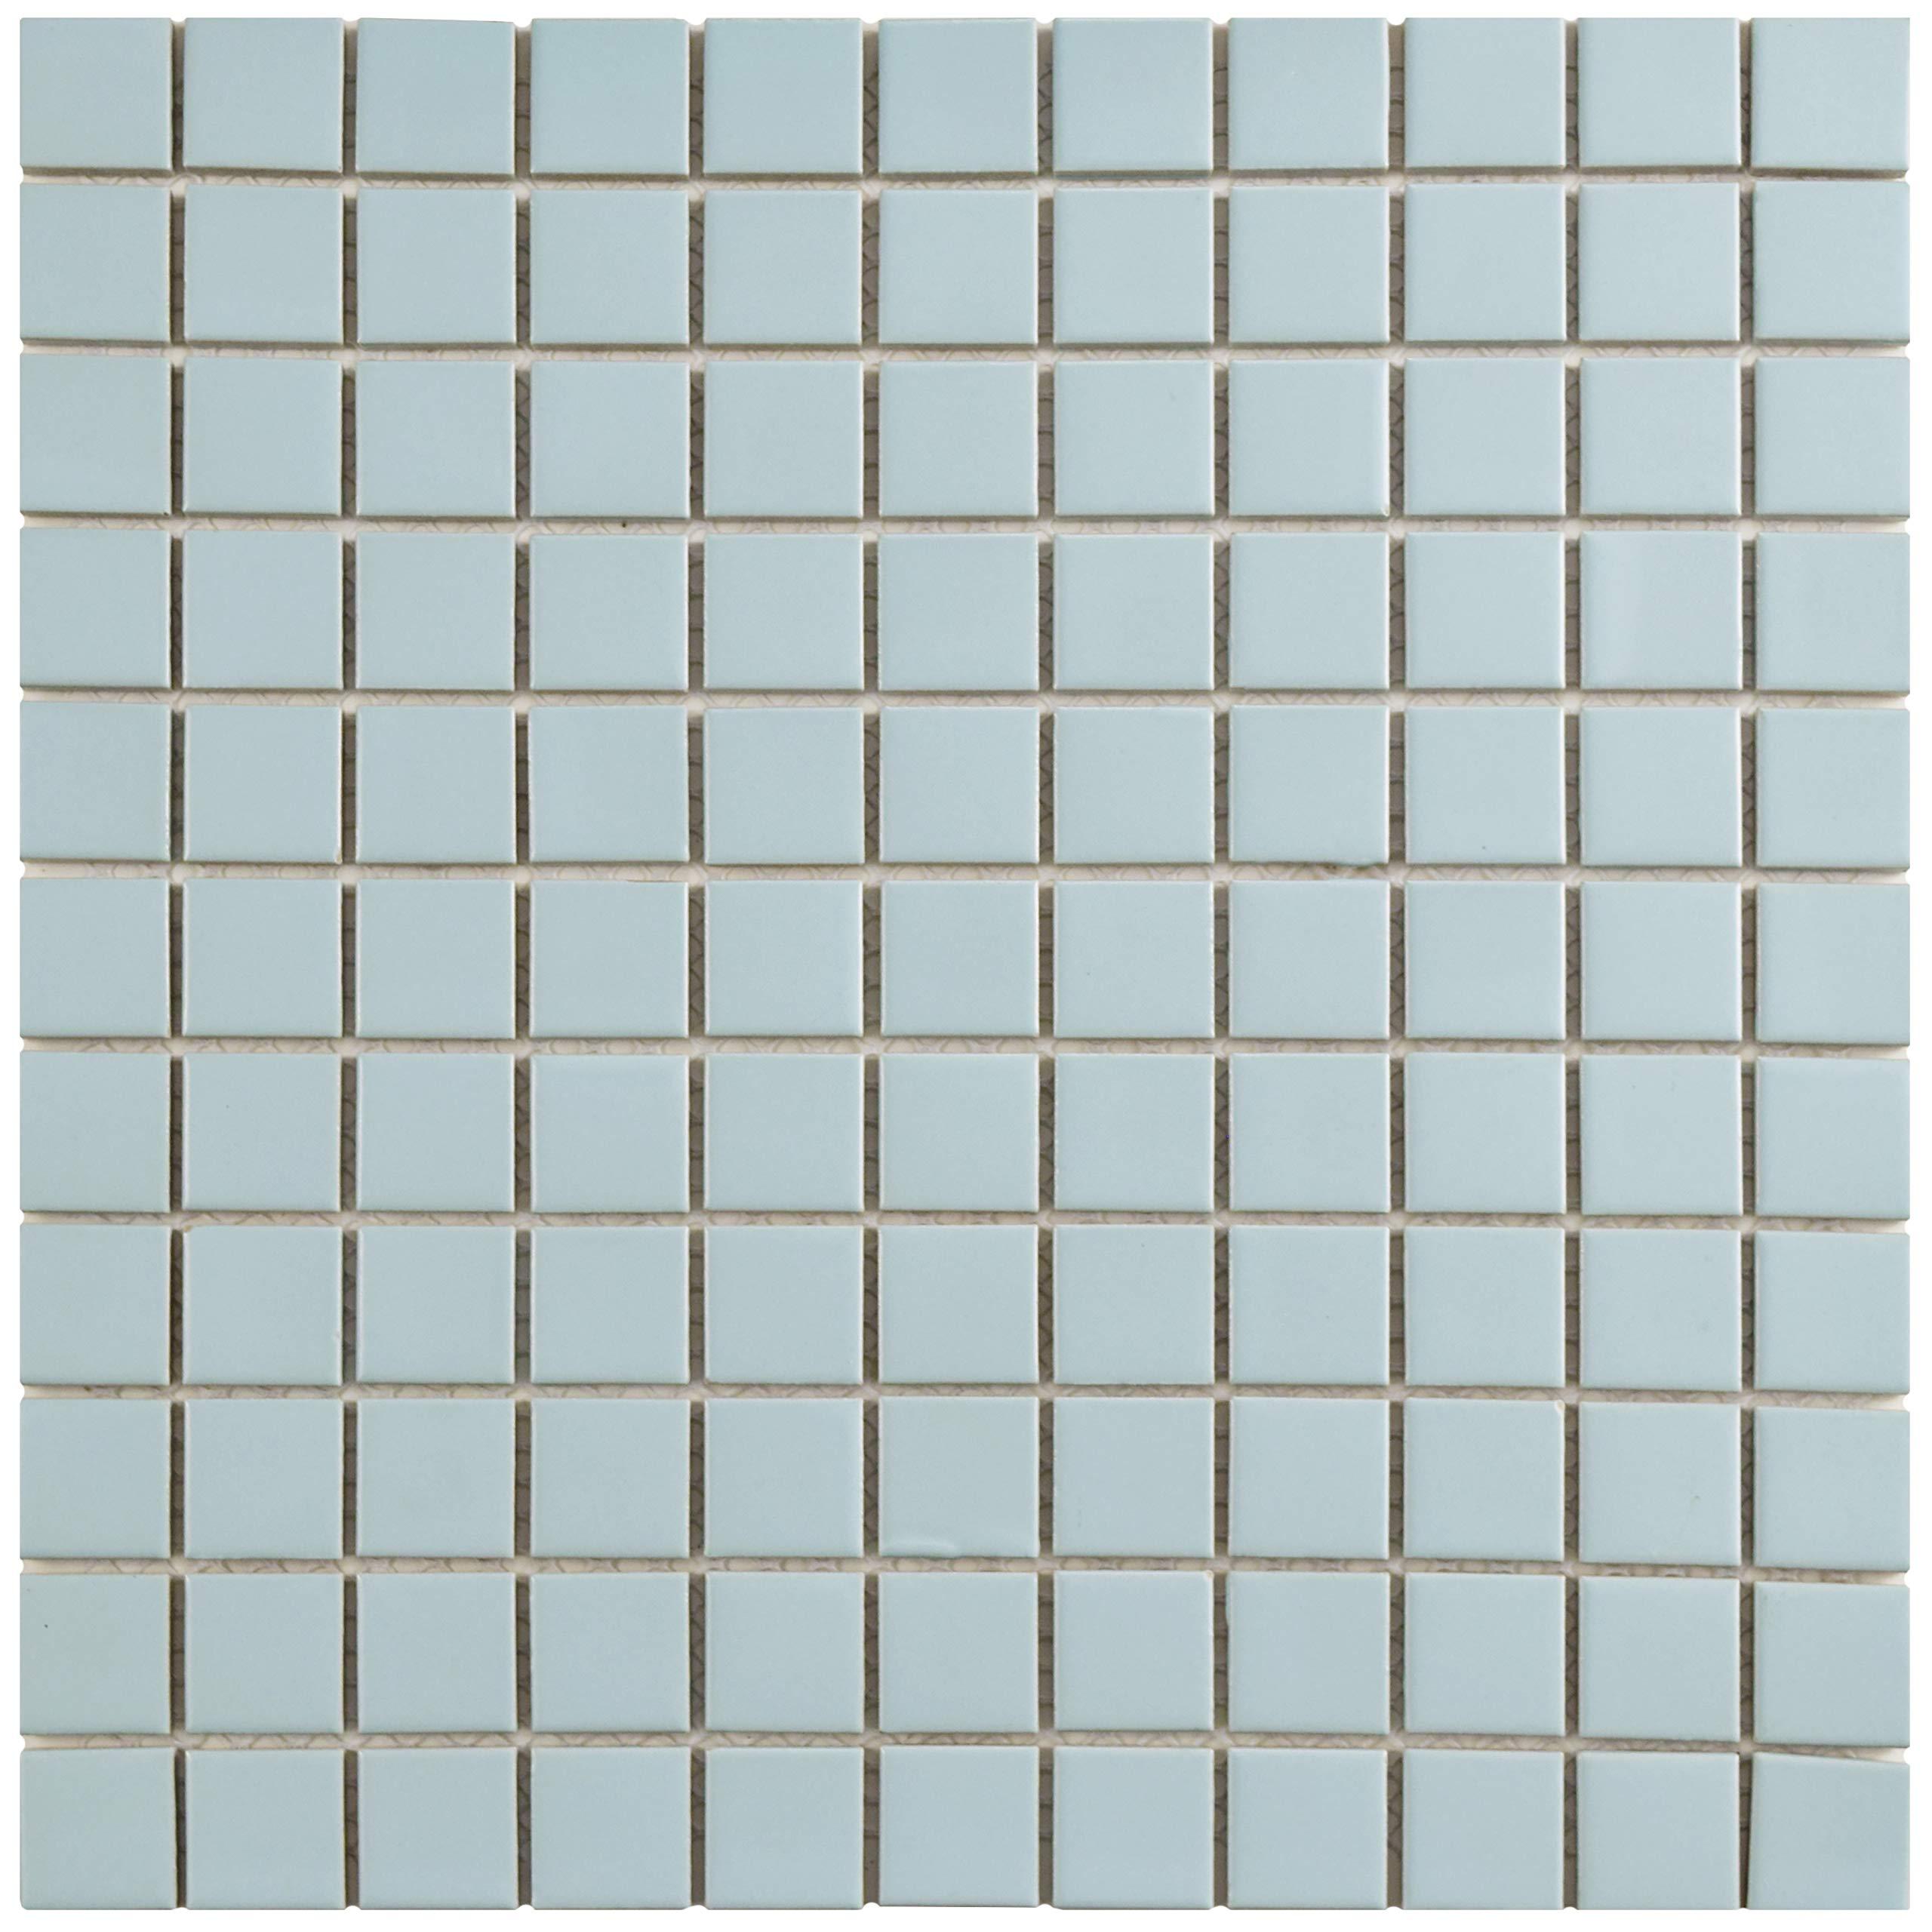 SomerTile FXLMS1BL Retro Square Porcelain Floor and Wall Tile, 11.75'' x 11.75'', Matte Light Blue